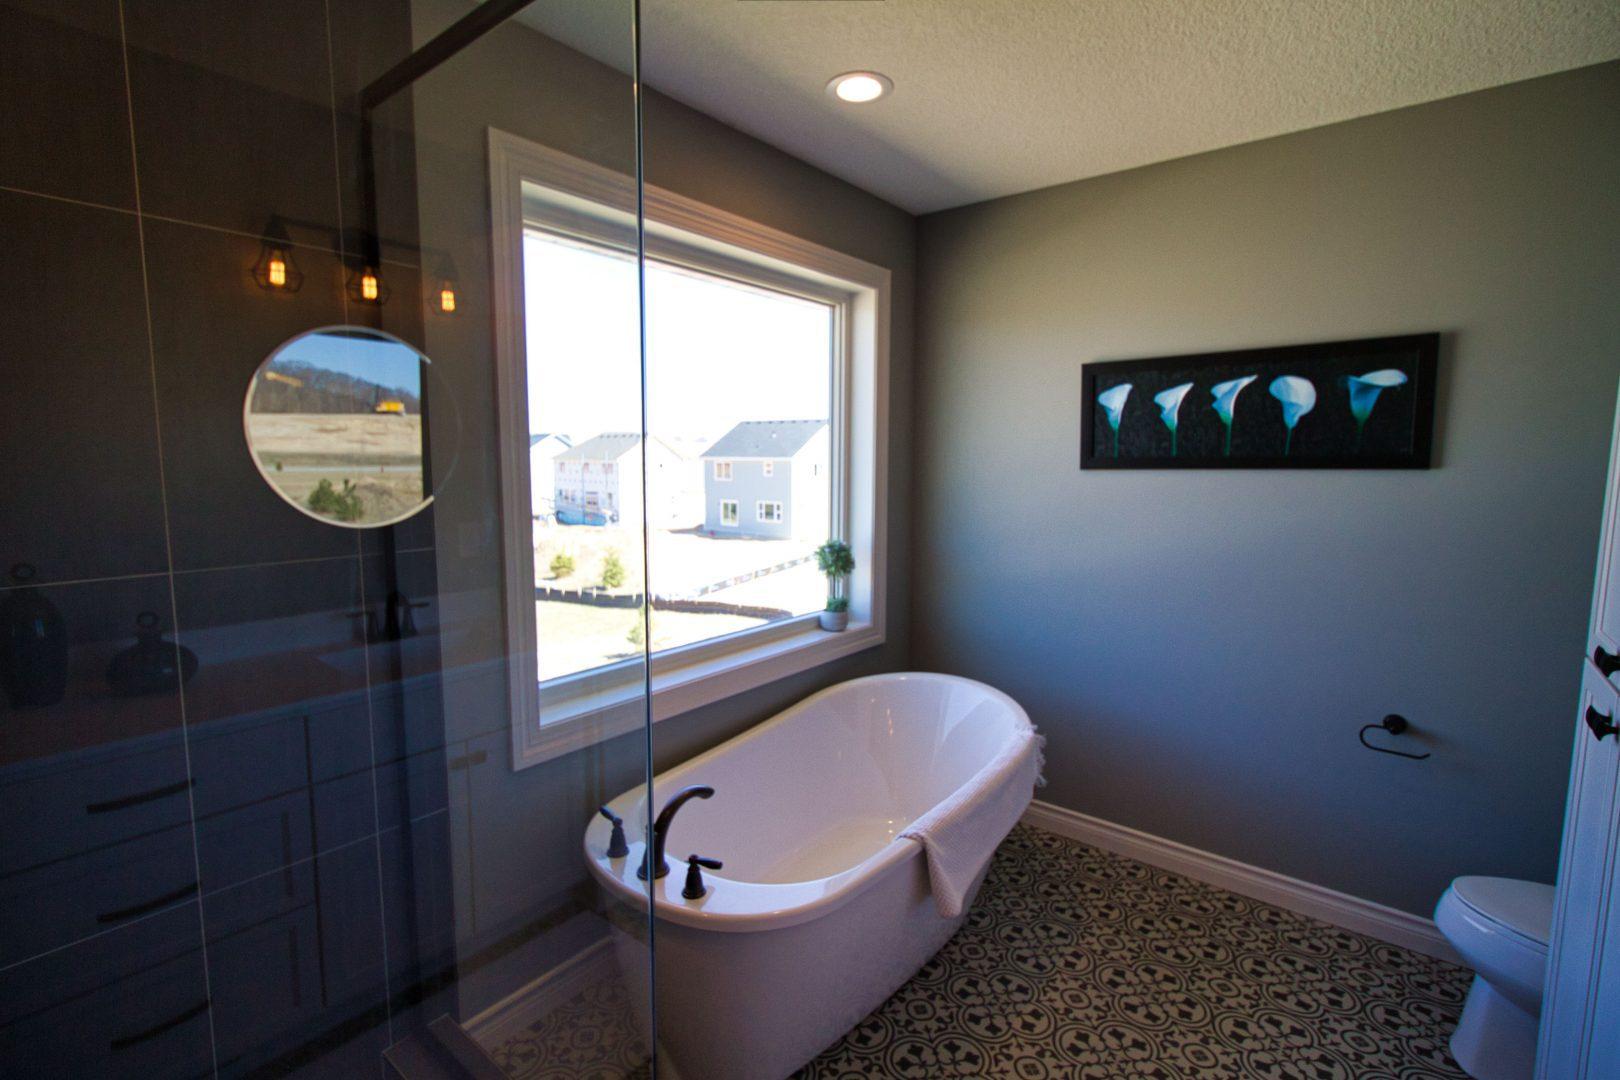 Bathroom featuring deep tub